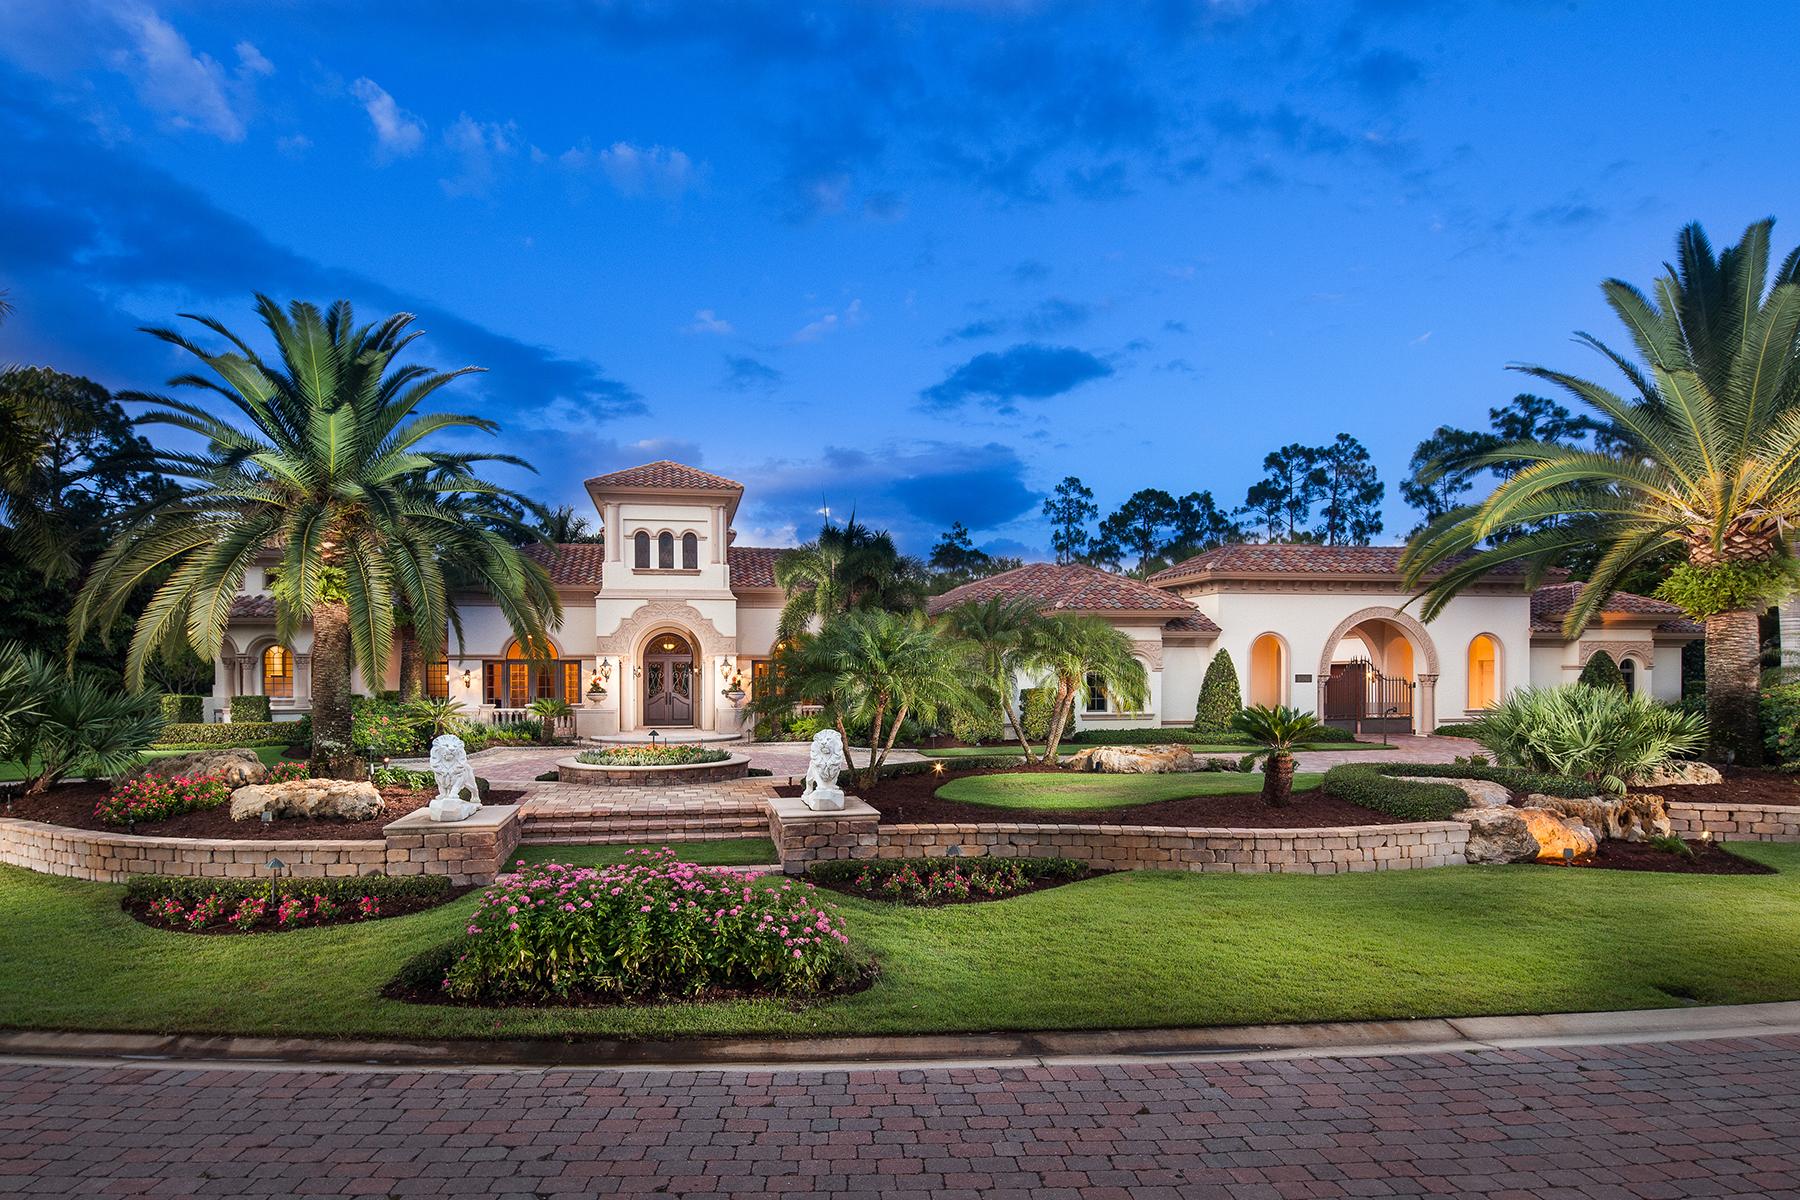 Villa per Vendita alle ore MEDITERRA - VERONA 16961 Verona Ln Naples, Florida, 34110 Stati Uniti